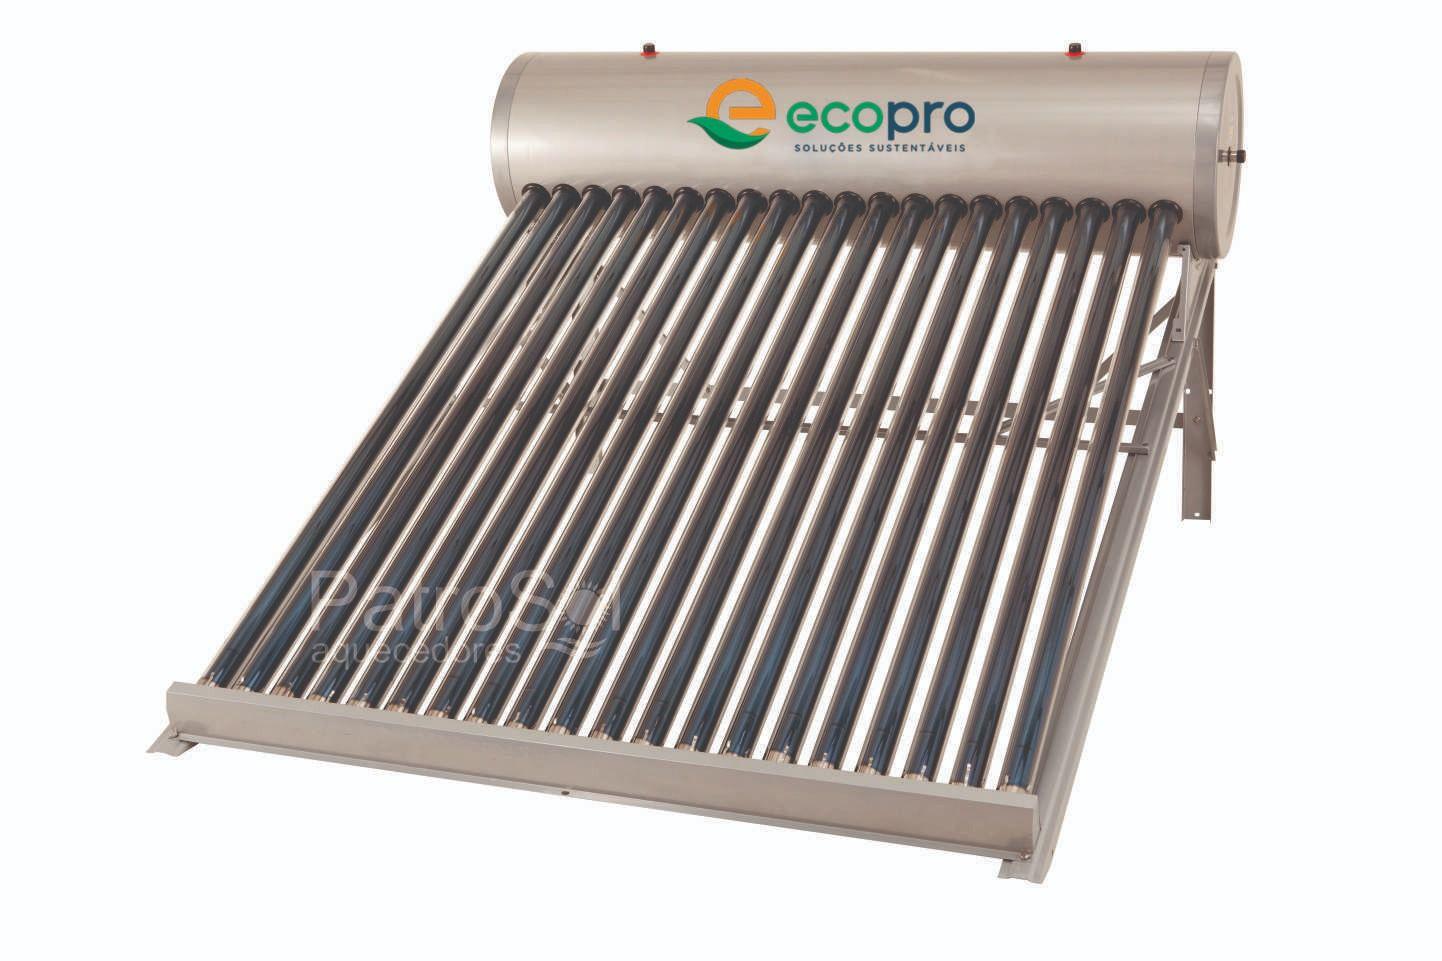 Kit Aquecedor Solar A Vácuo Acoplado Boiler 178 Litros - 20 Tubos